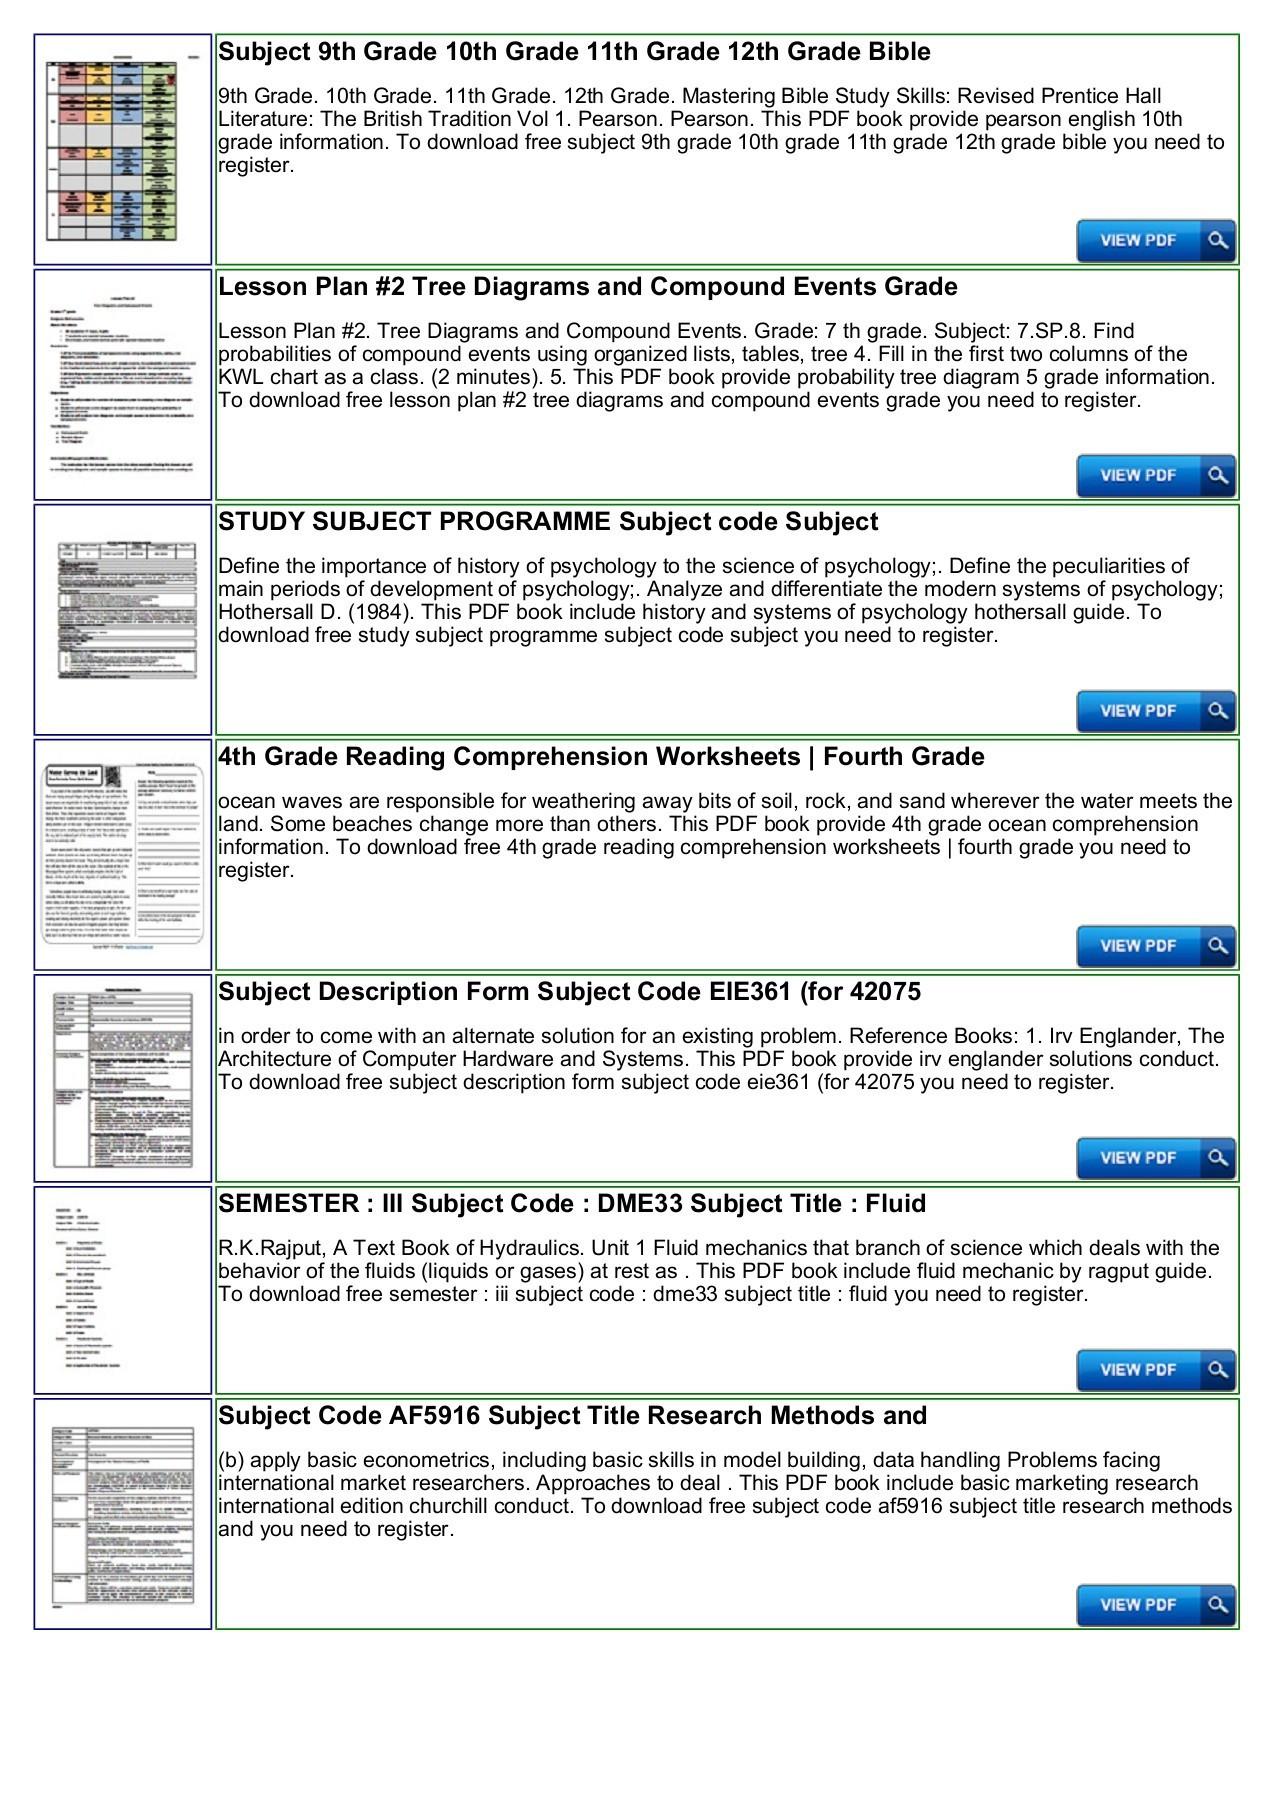 30 Stem Changing Verbs Worksheet Answers